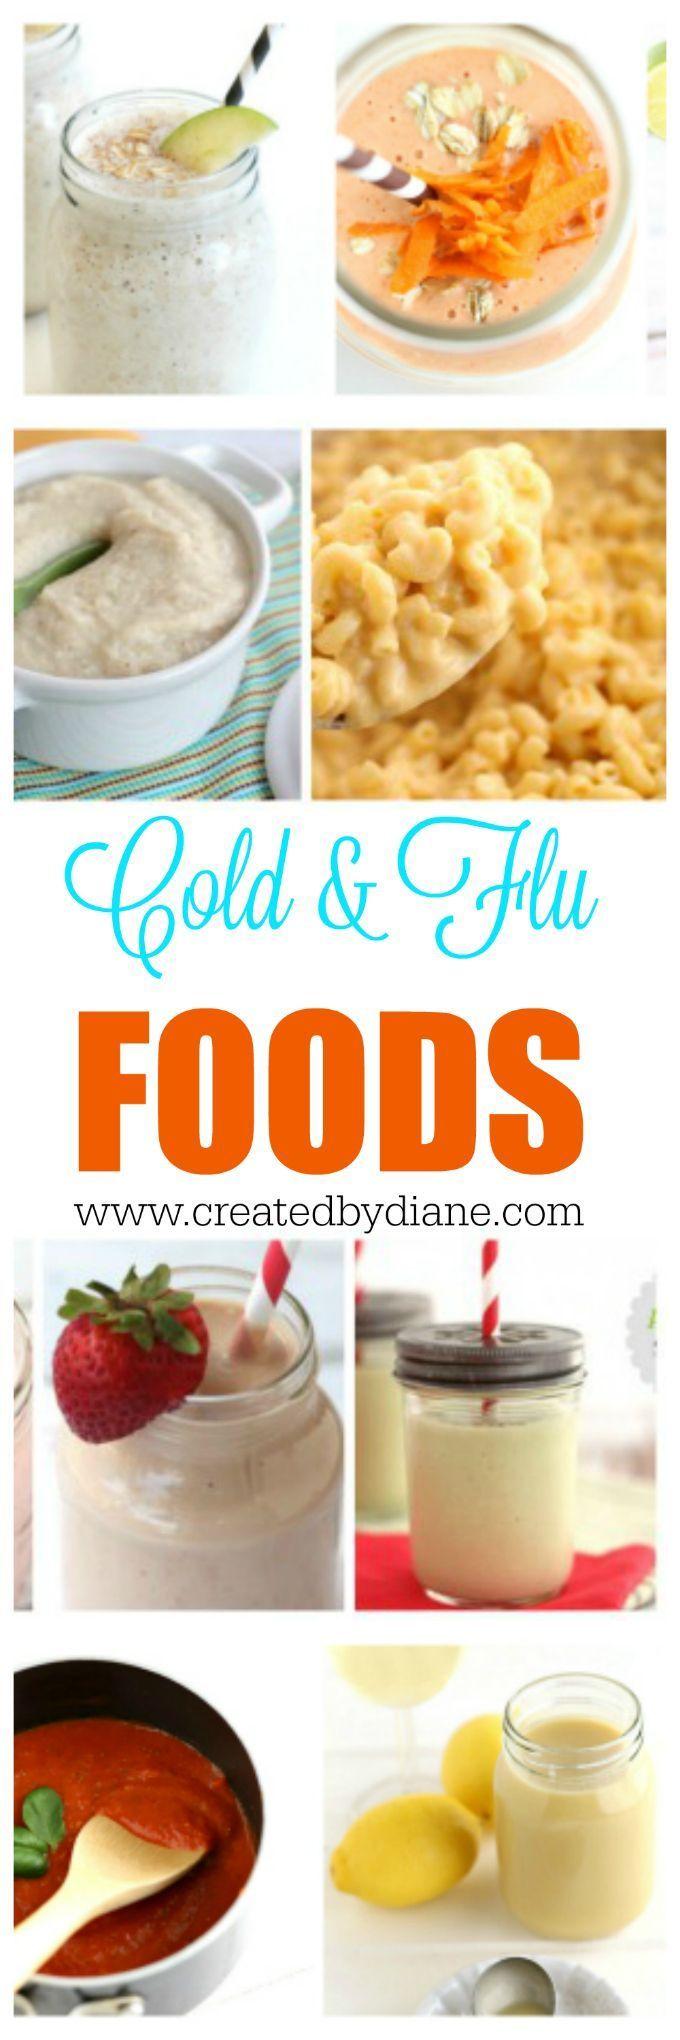 Cool Soft Food Diet